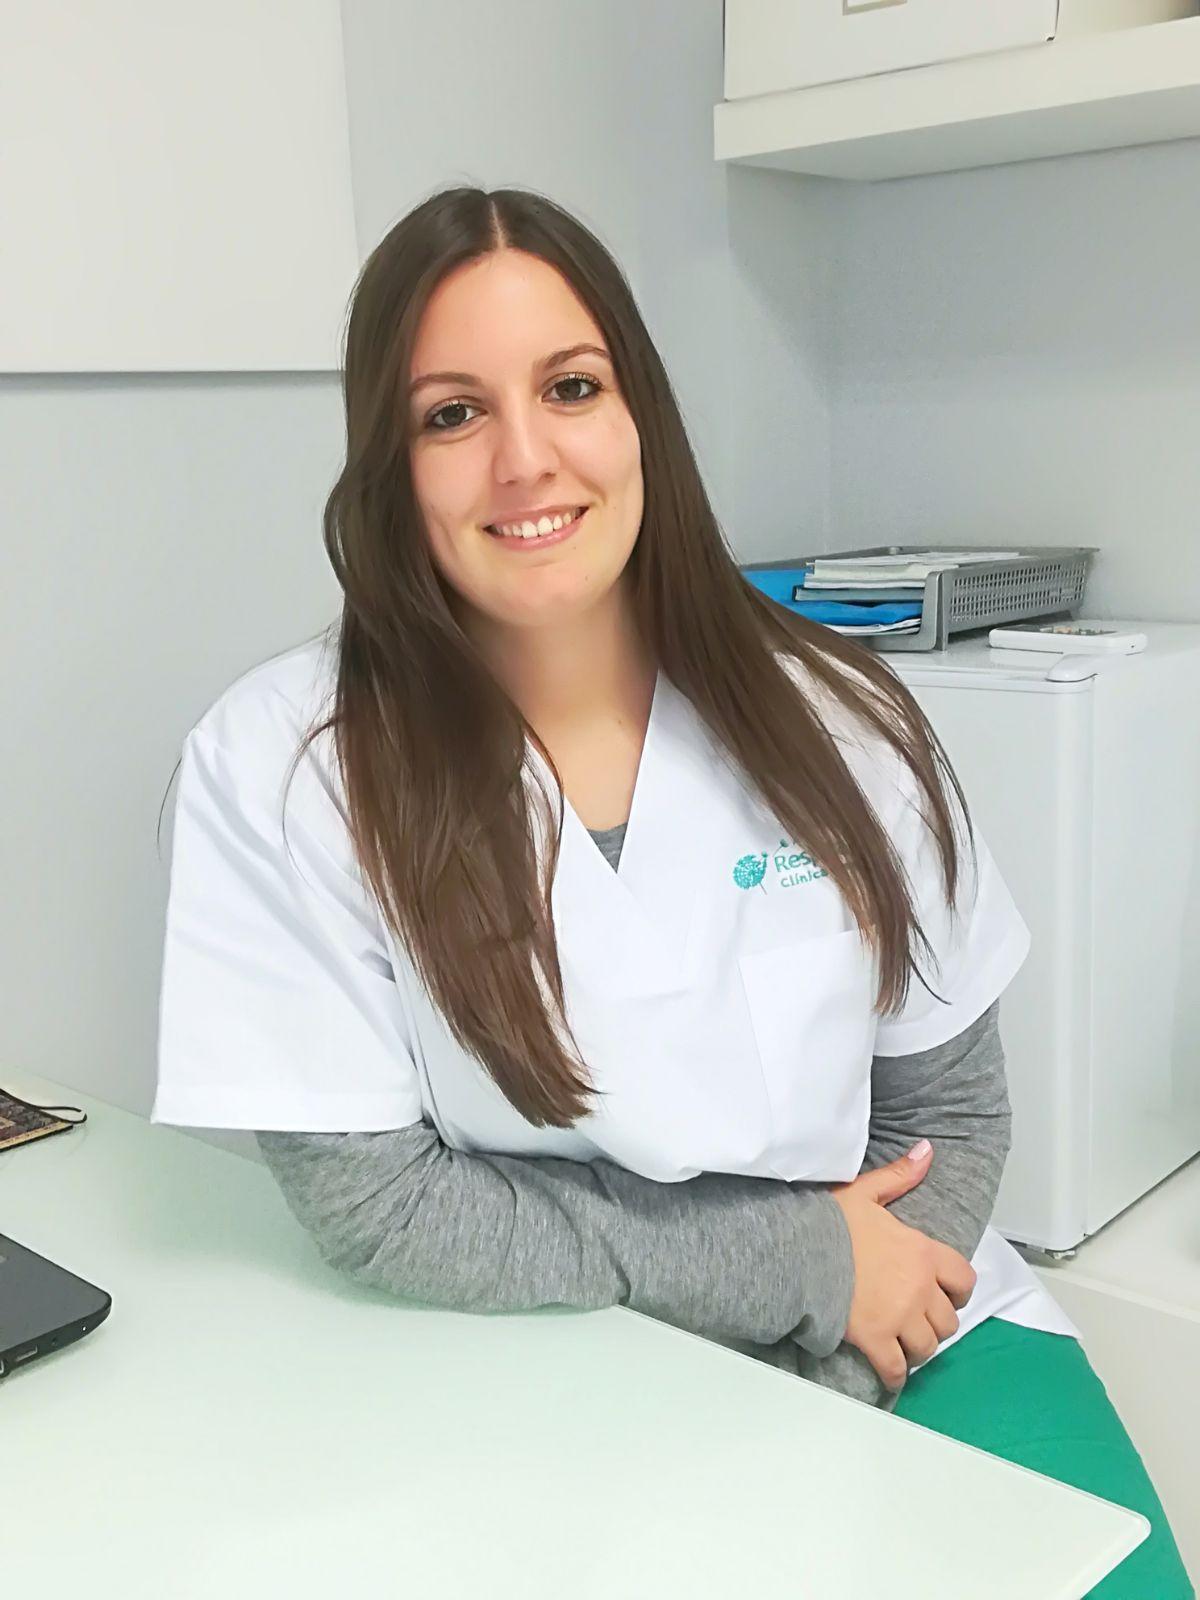 monica orfila fisioterapeuta respiratorio clinica respiratoria respira mejor sabadell y sant cugat